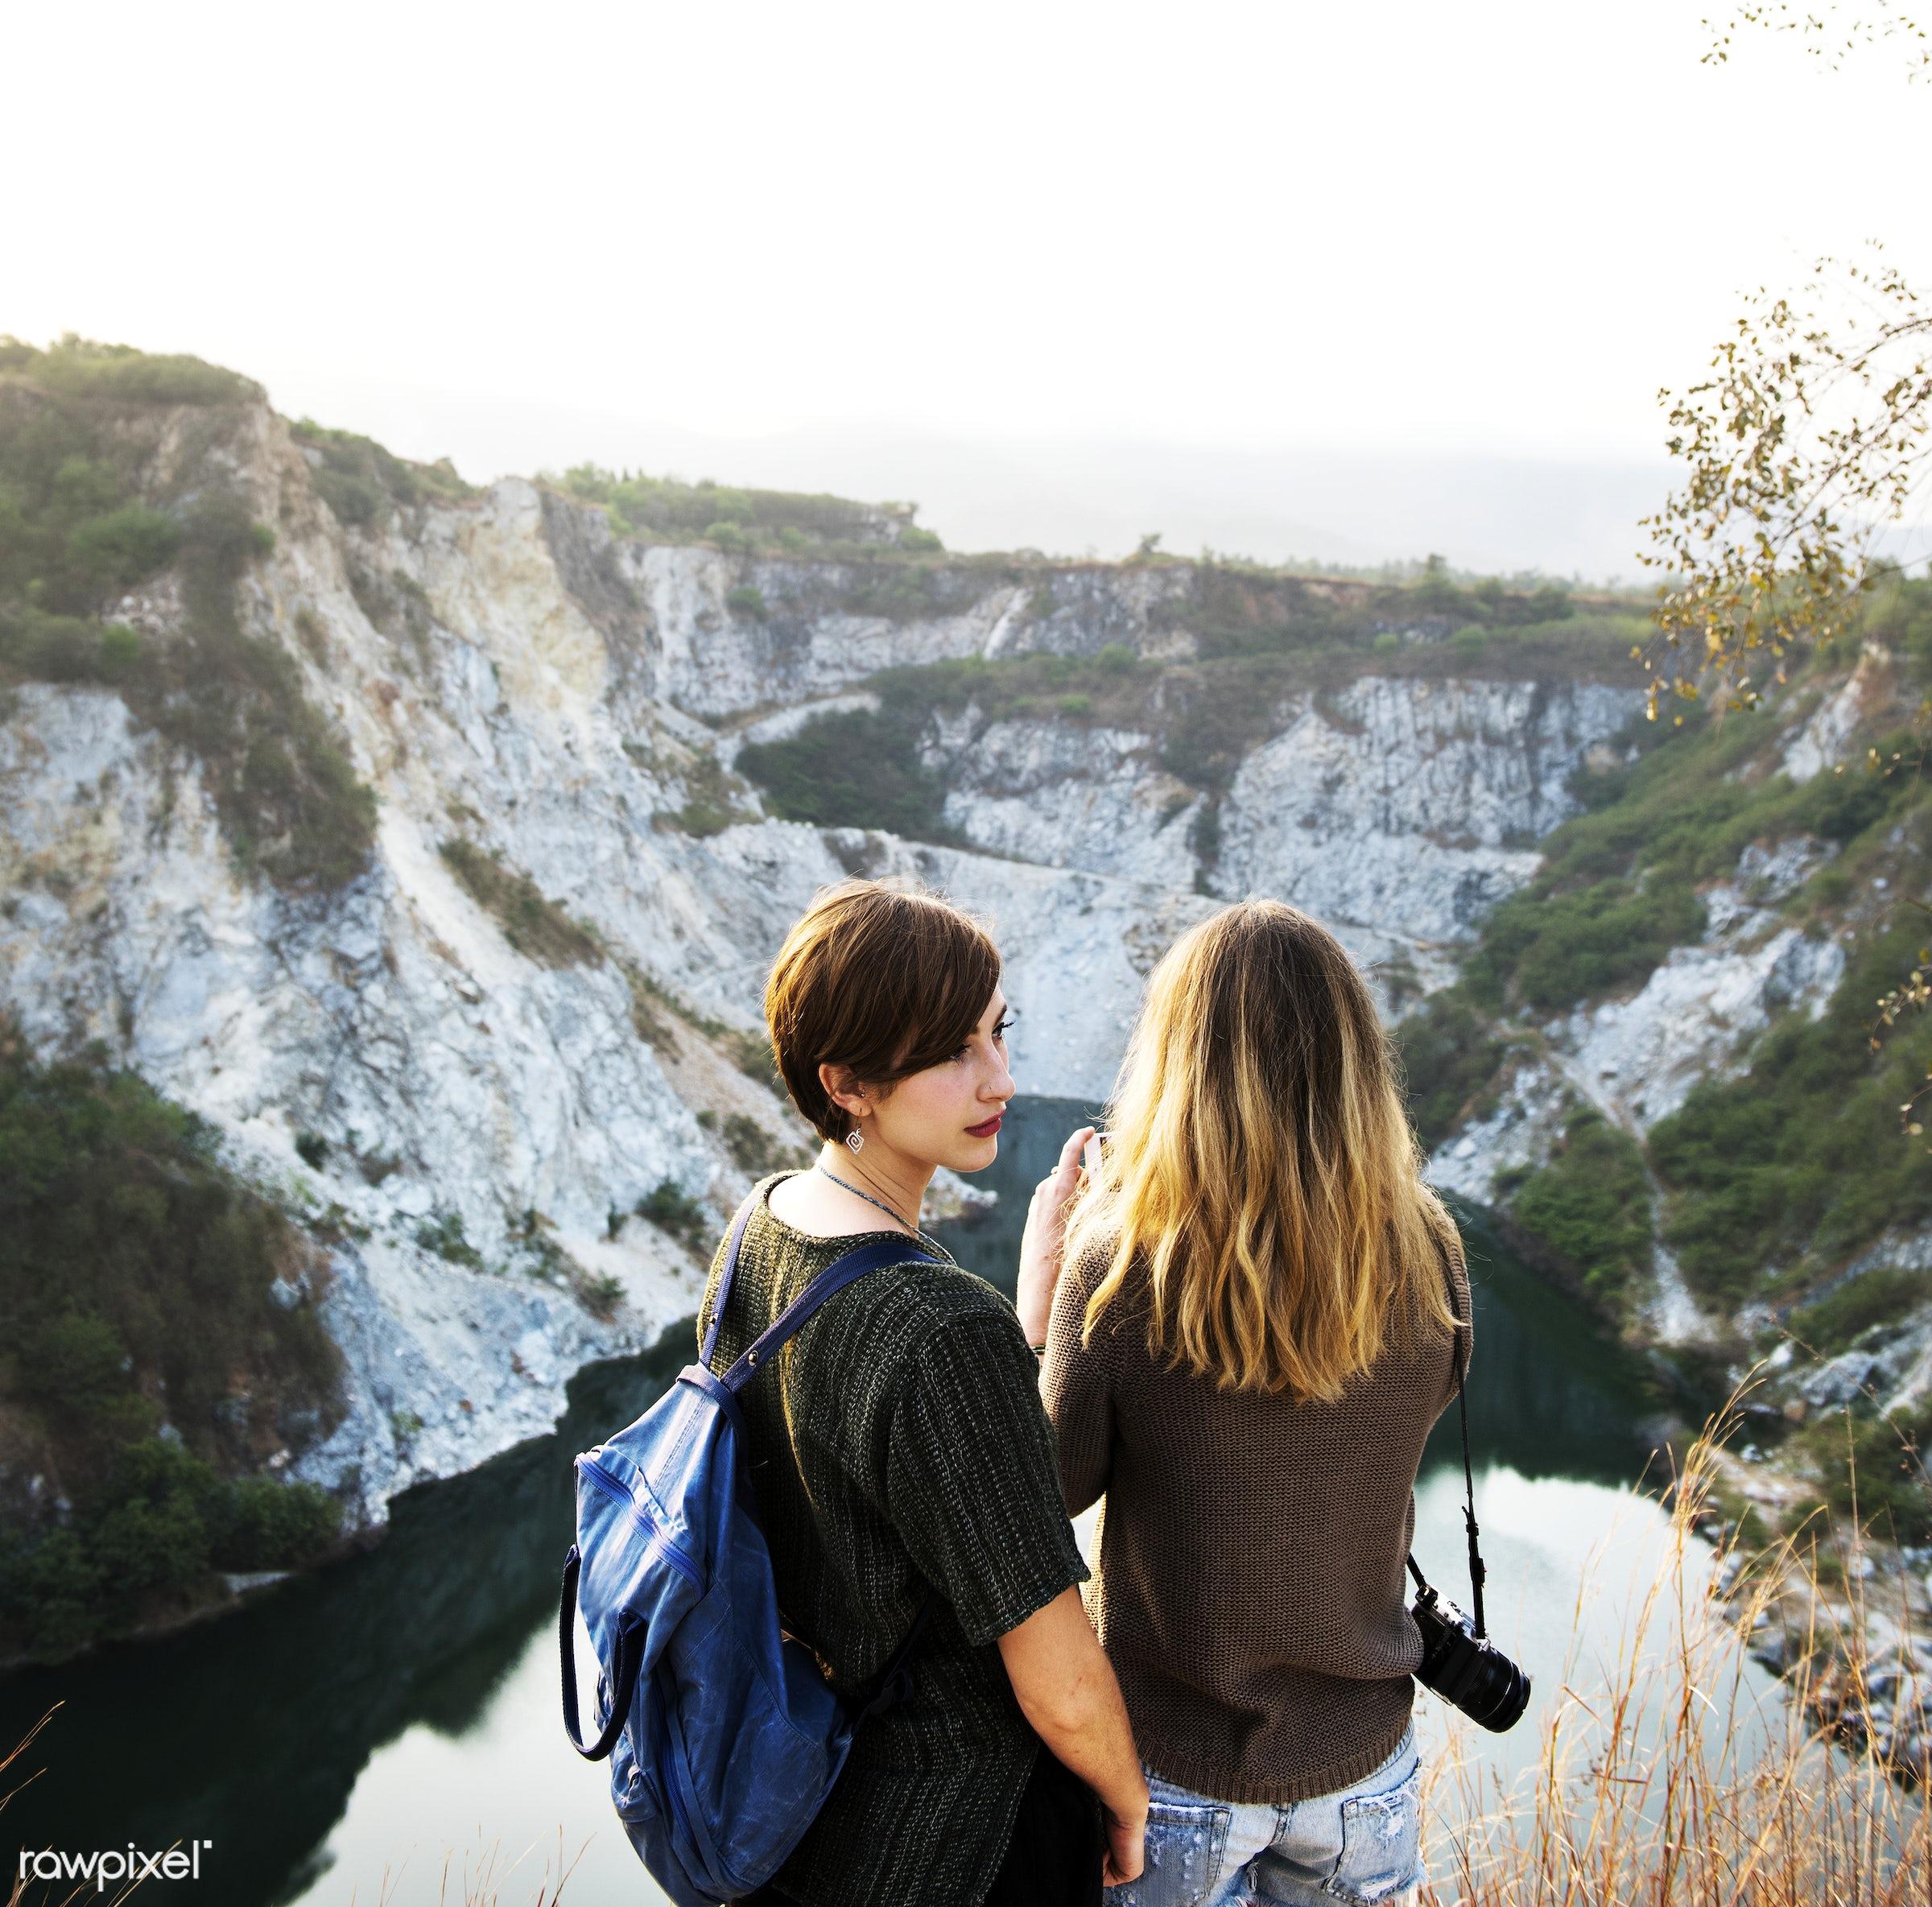 mountain, freedom, tranquil scene, girlfriends, travel, recreation, friends, nature, friendship, girls, rear view, peaceful...